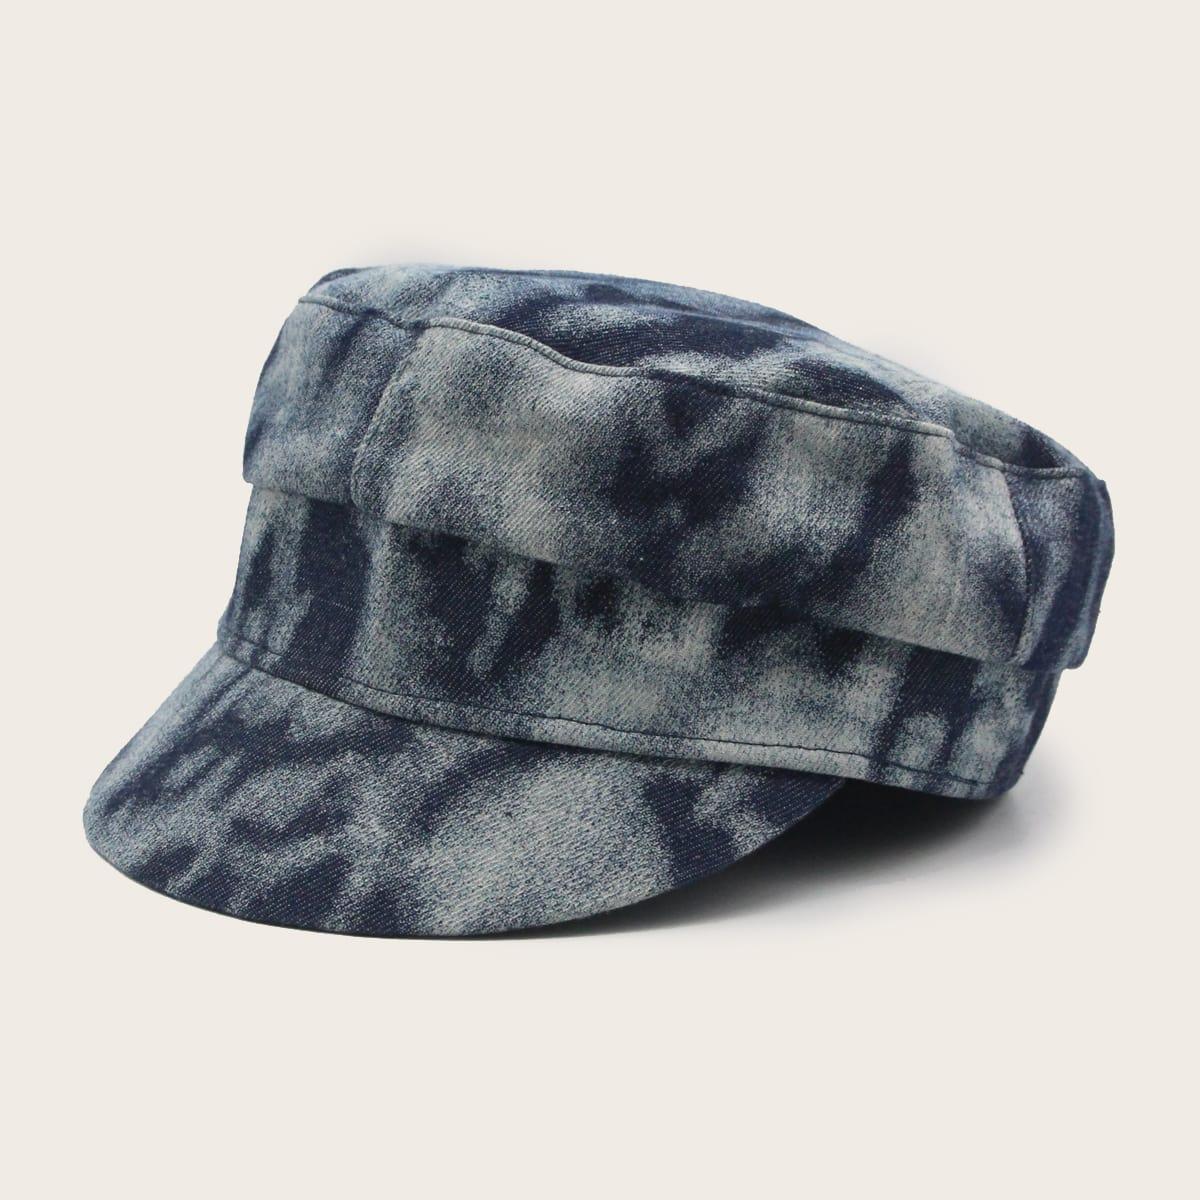 Простая кепка для мальчика Бейкер от SHEIN